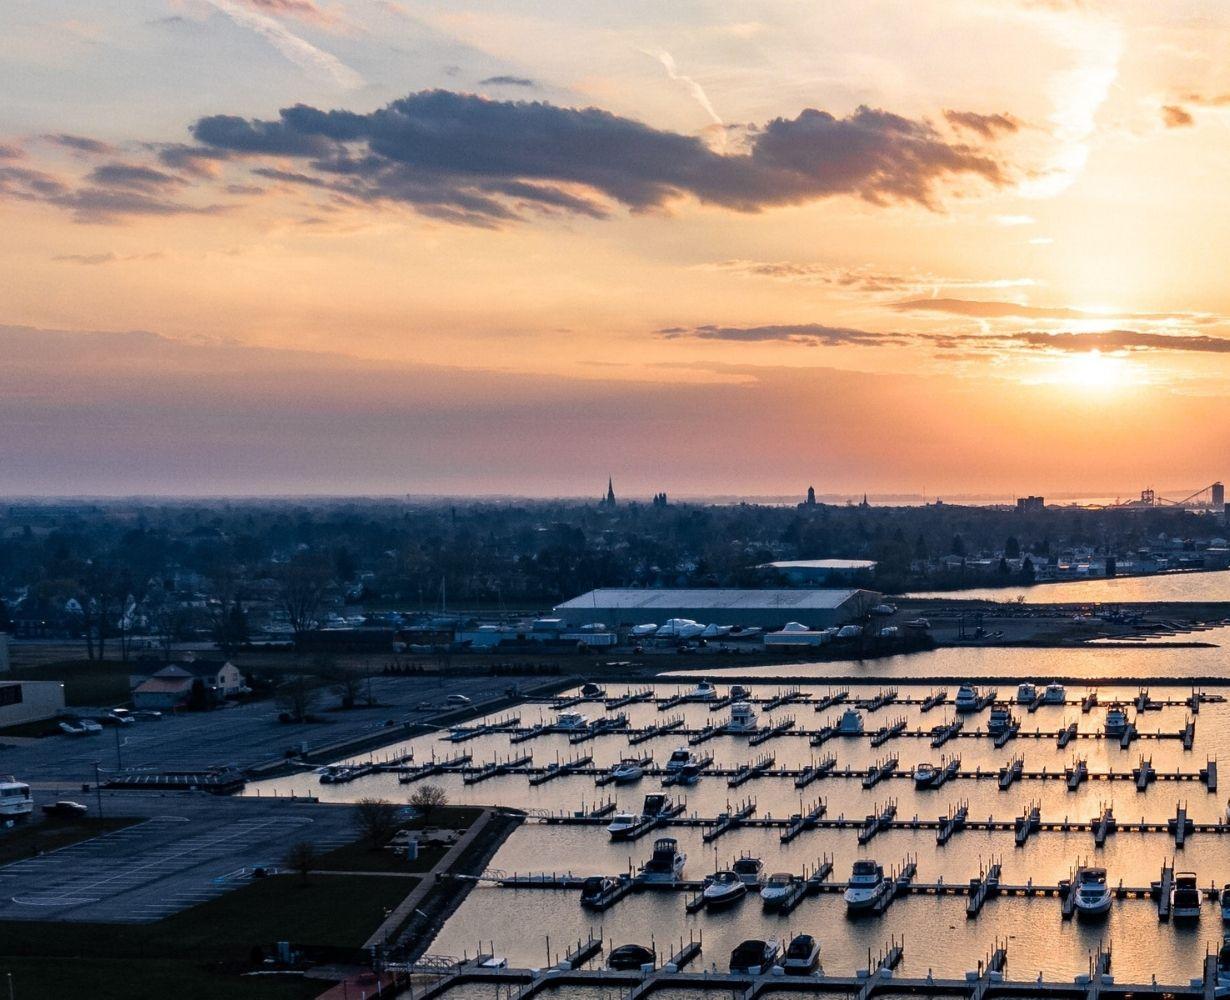 son-rise-marina-sandusky-ohio-gallery-docks